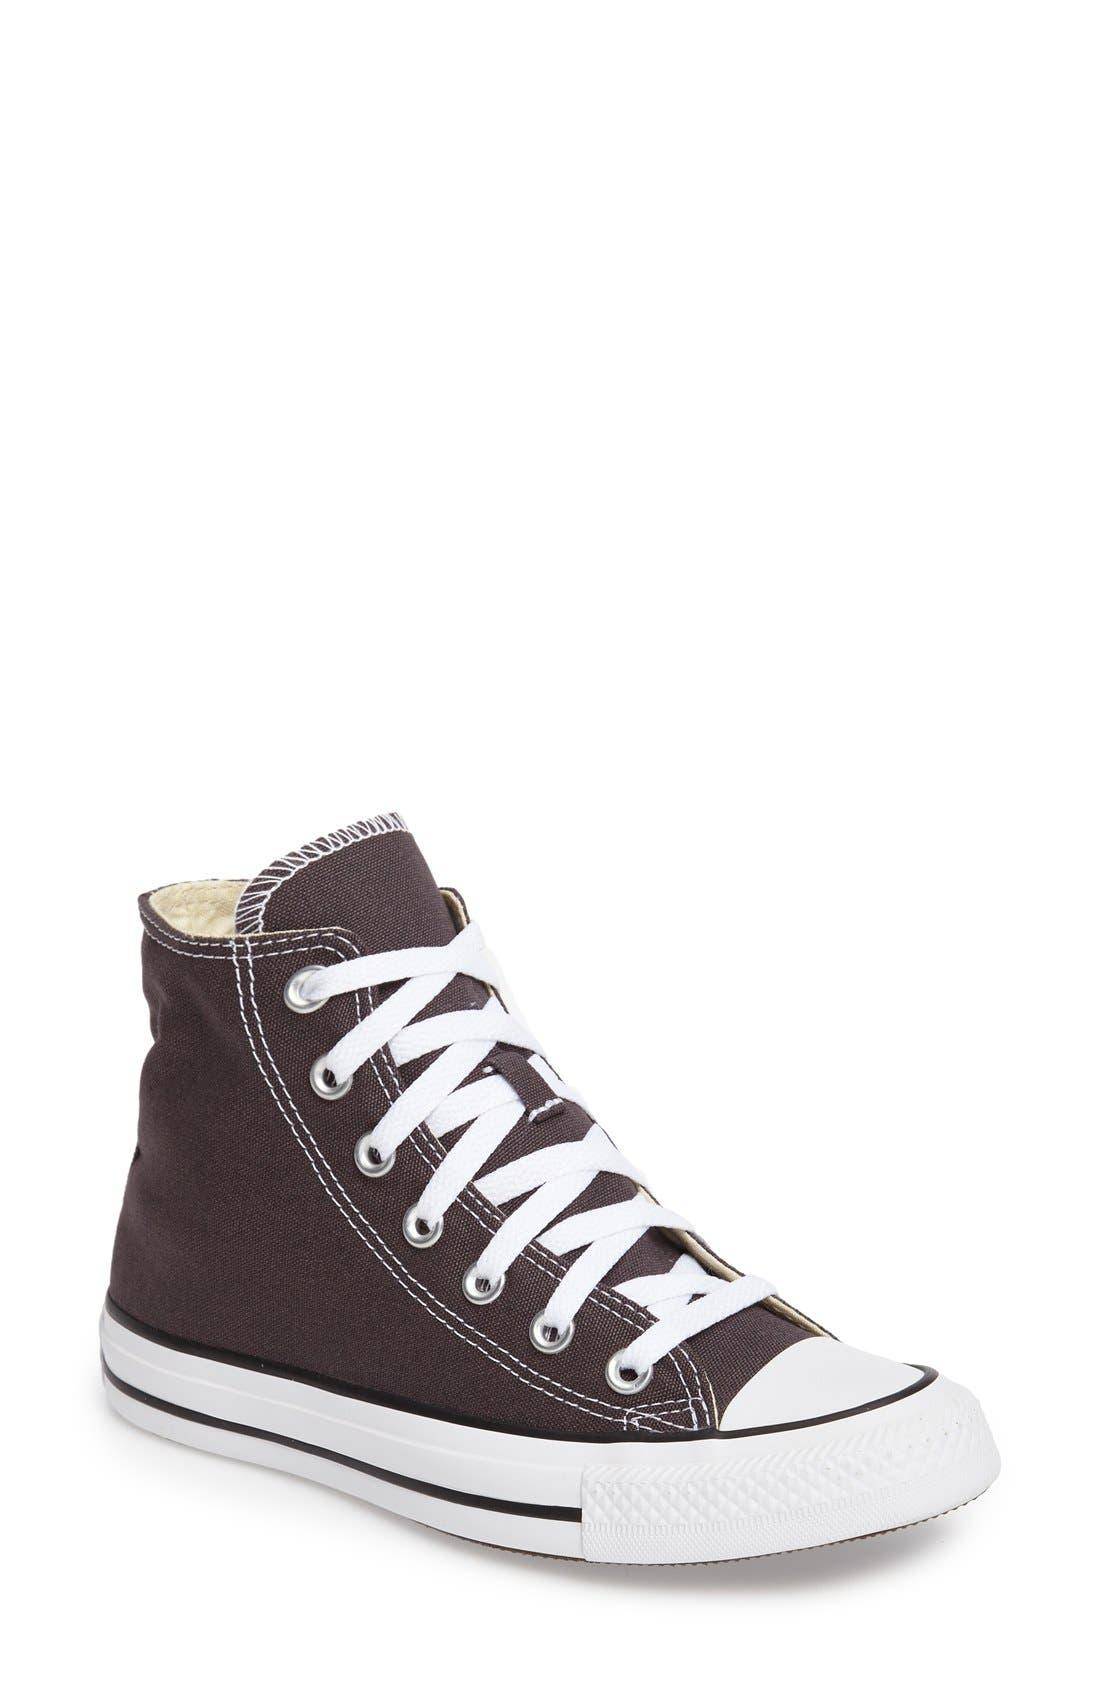 Main Image - Converse Chuck Taylor® All Star® Seasonal High Top Sneaker (Women)